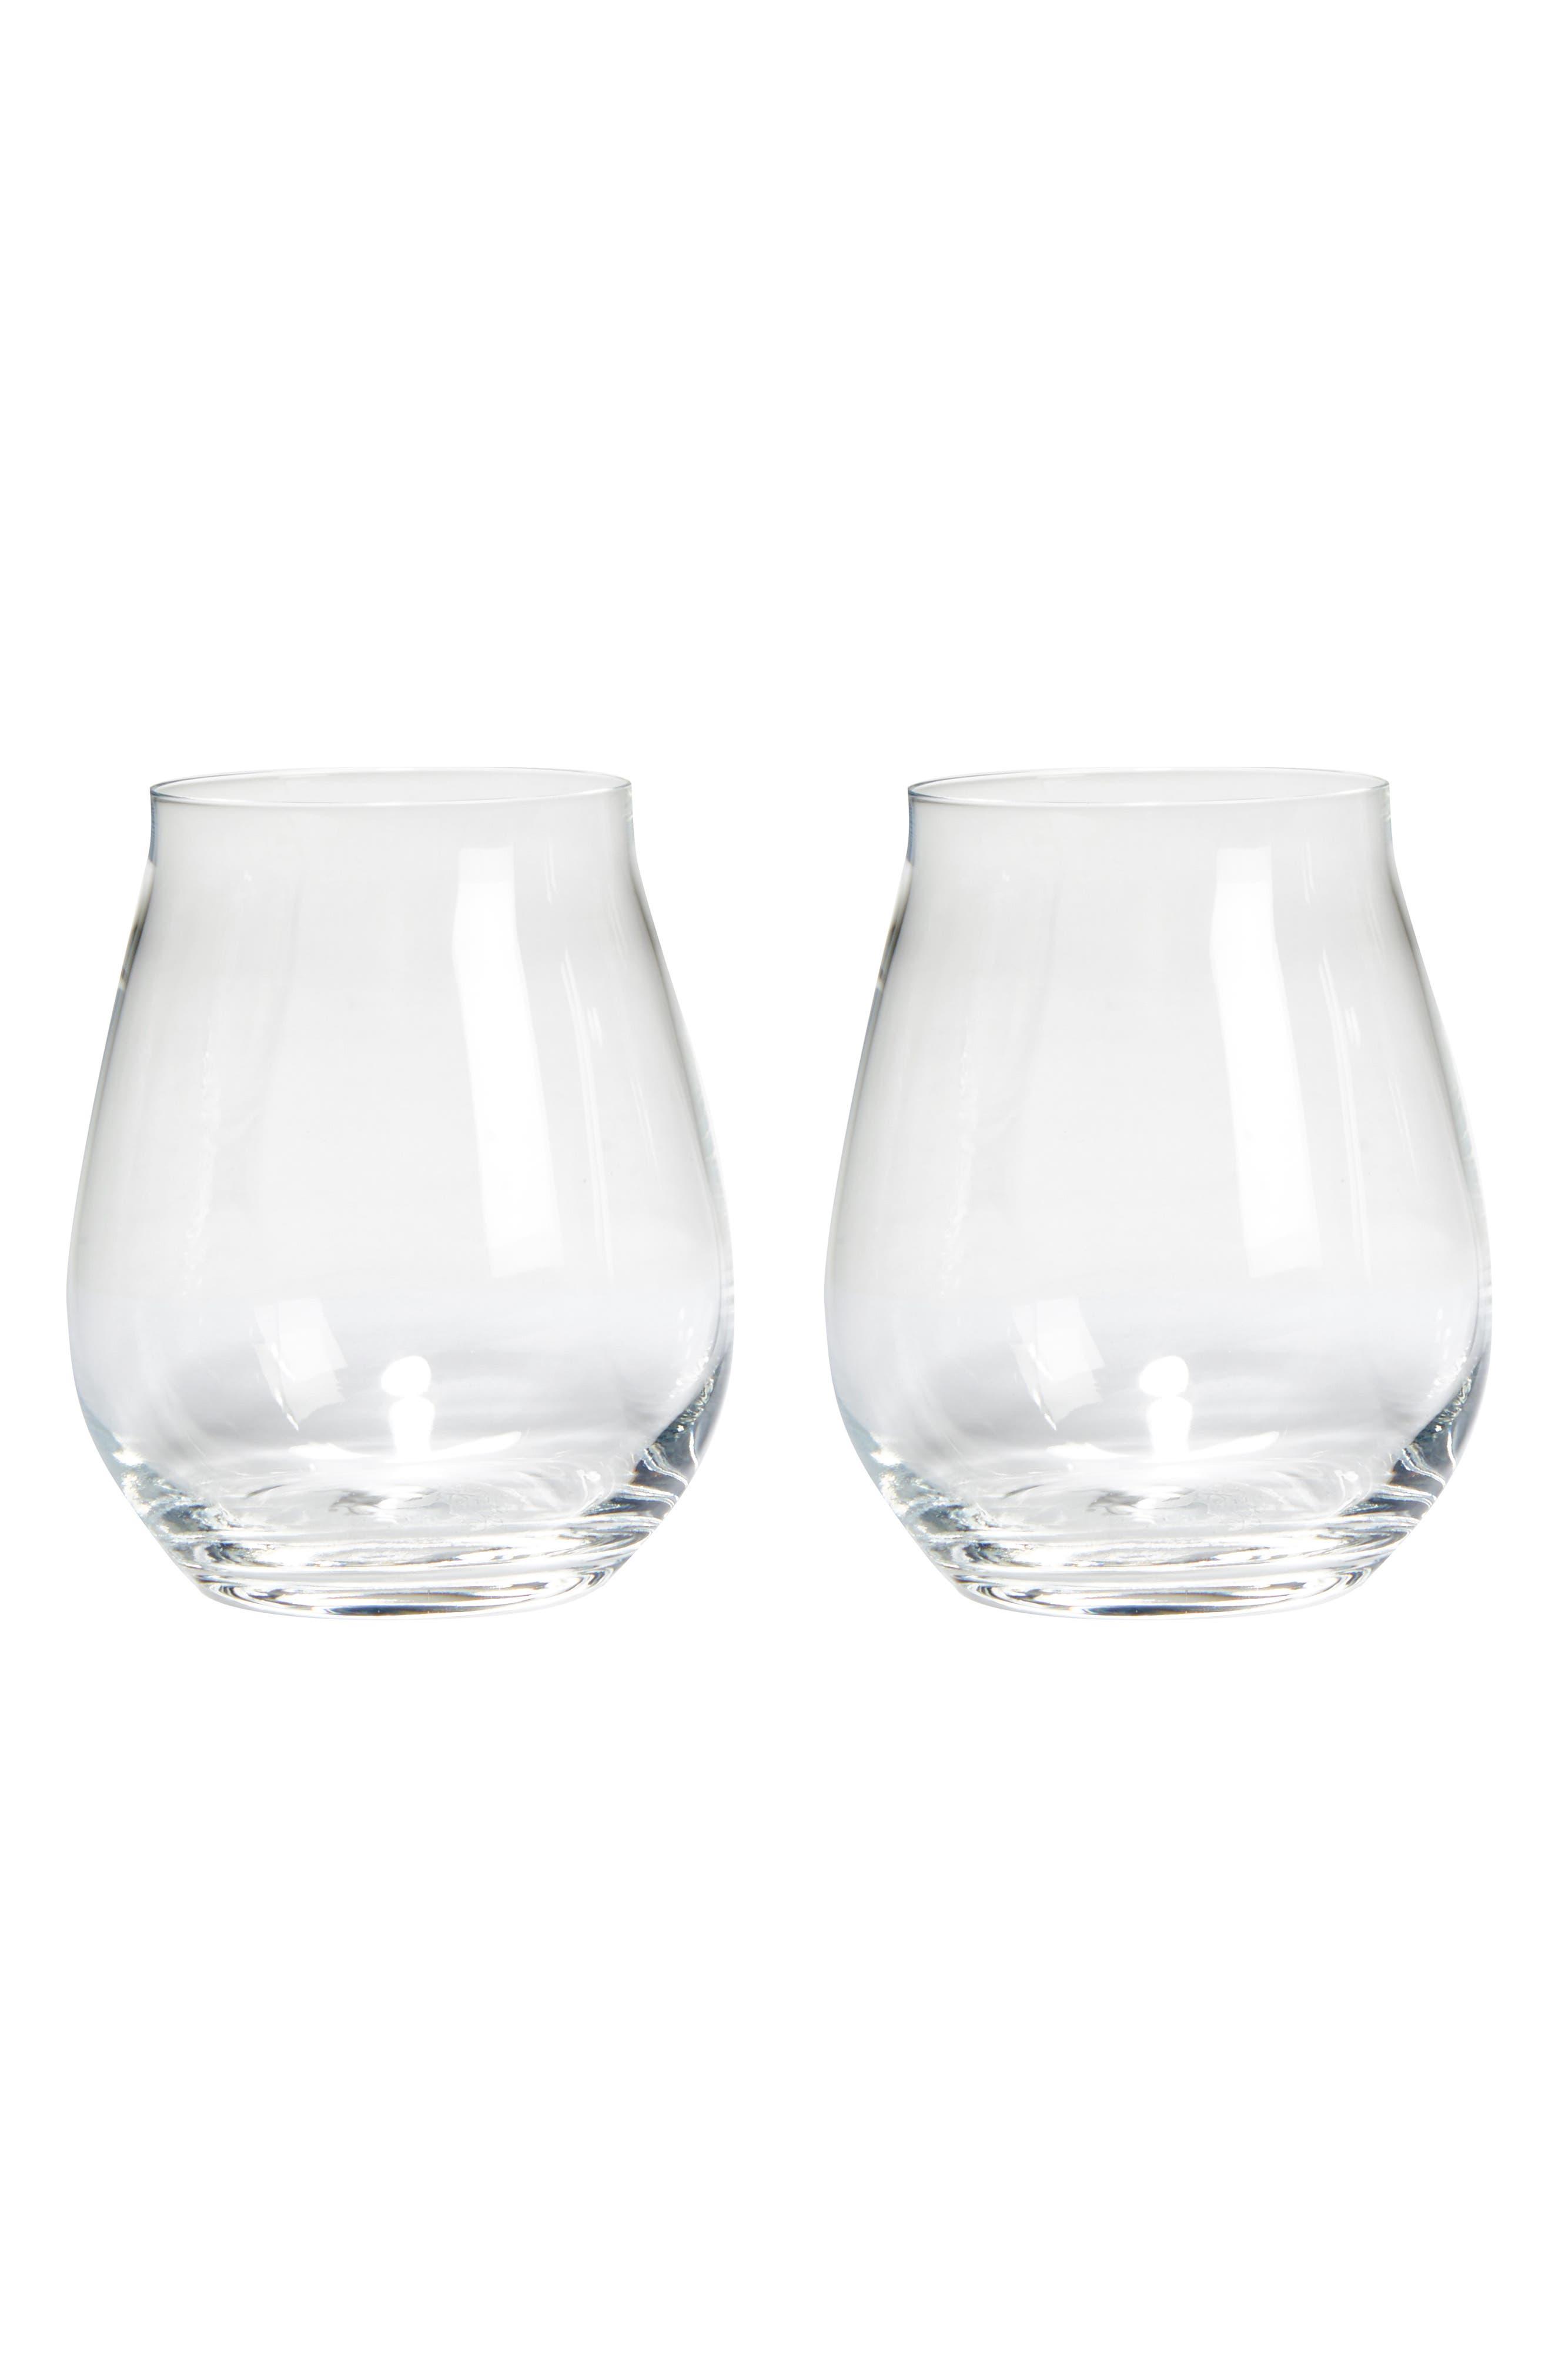 Main Image - Luigi Bormiolo Vinea Trebbiano Set of 2 Stemless Wine Glasses